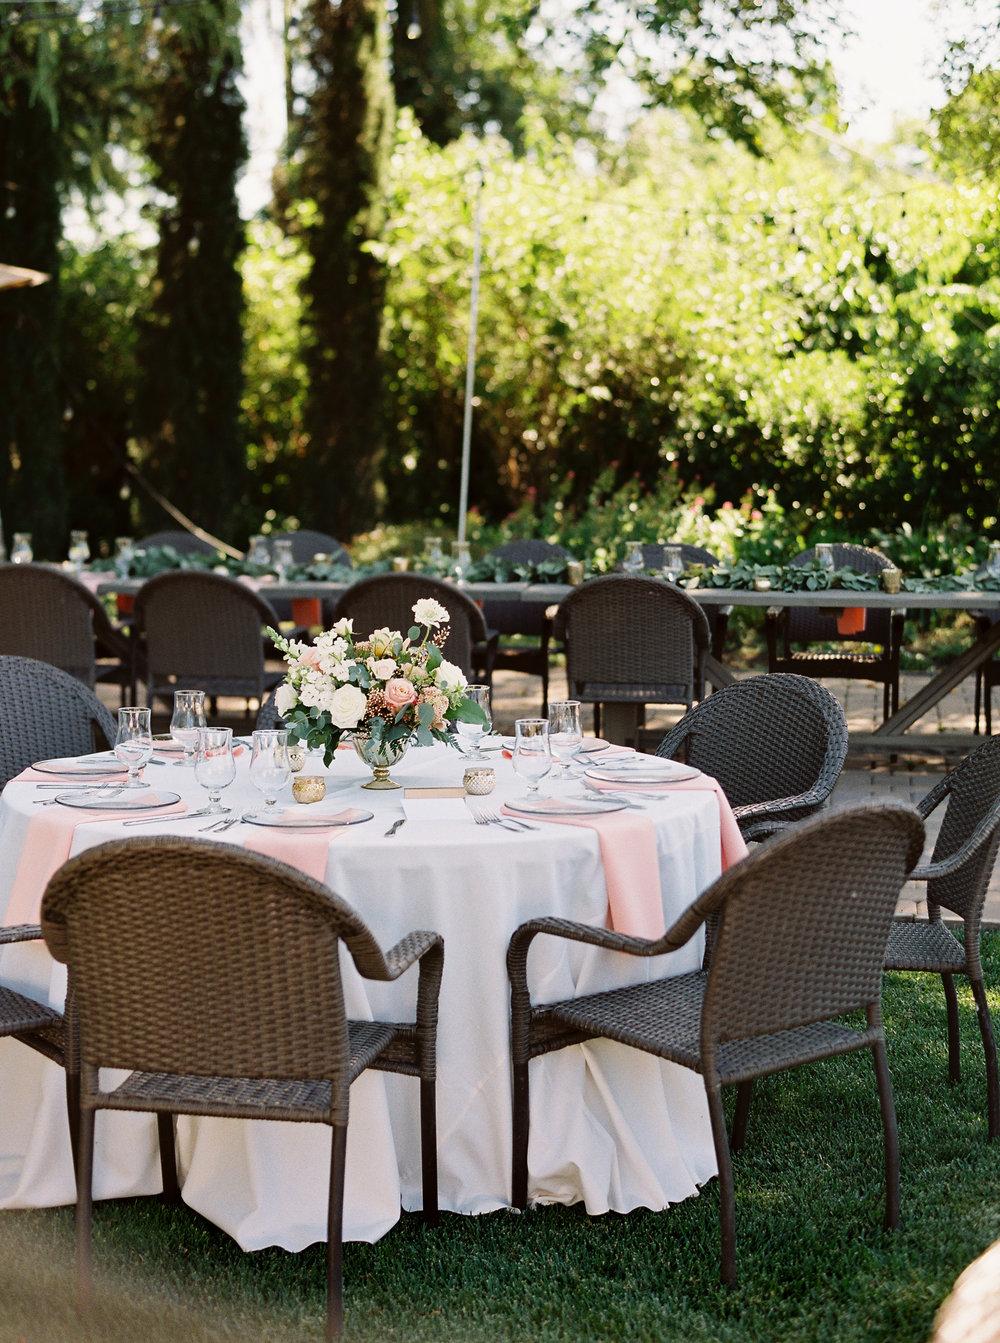 Durst-winery-wedding-in-lodi-calfornia-166.jpg